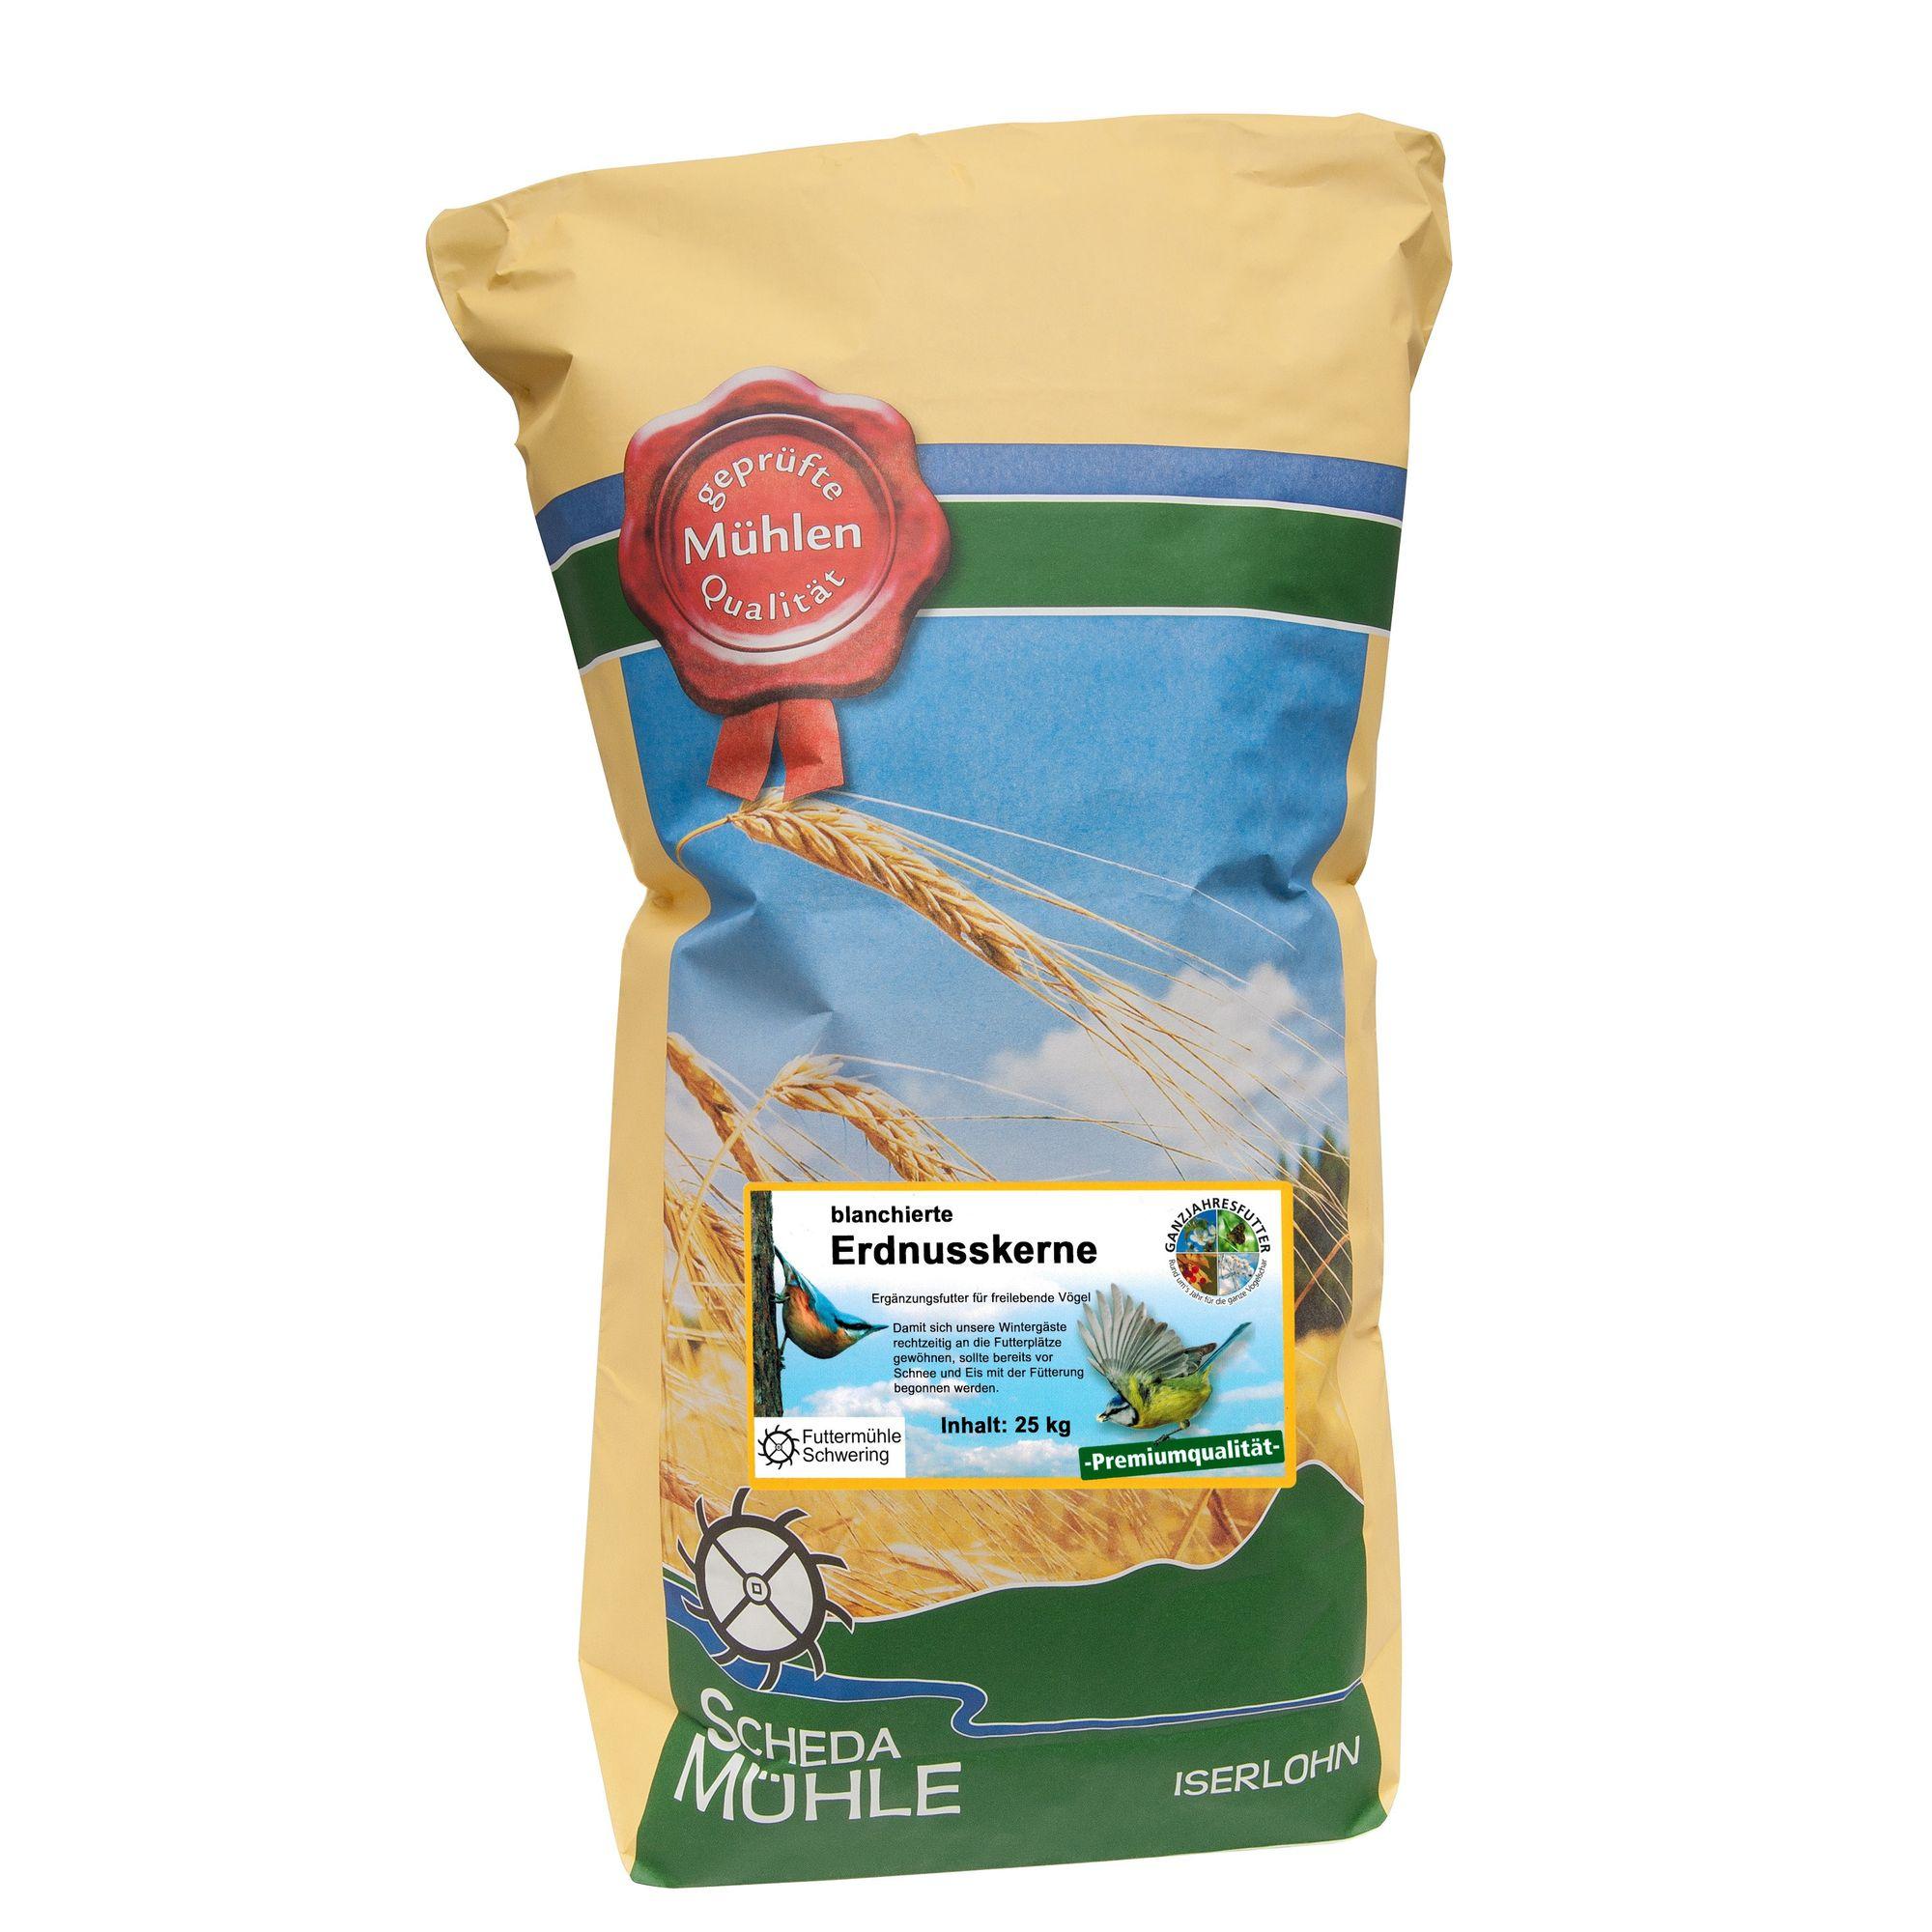 Erdnusskerne blanchiert, 25 kg Sack